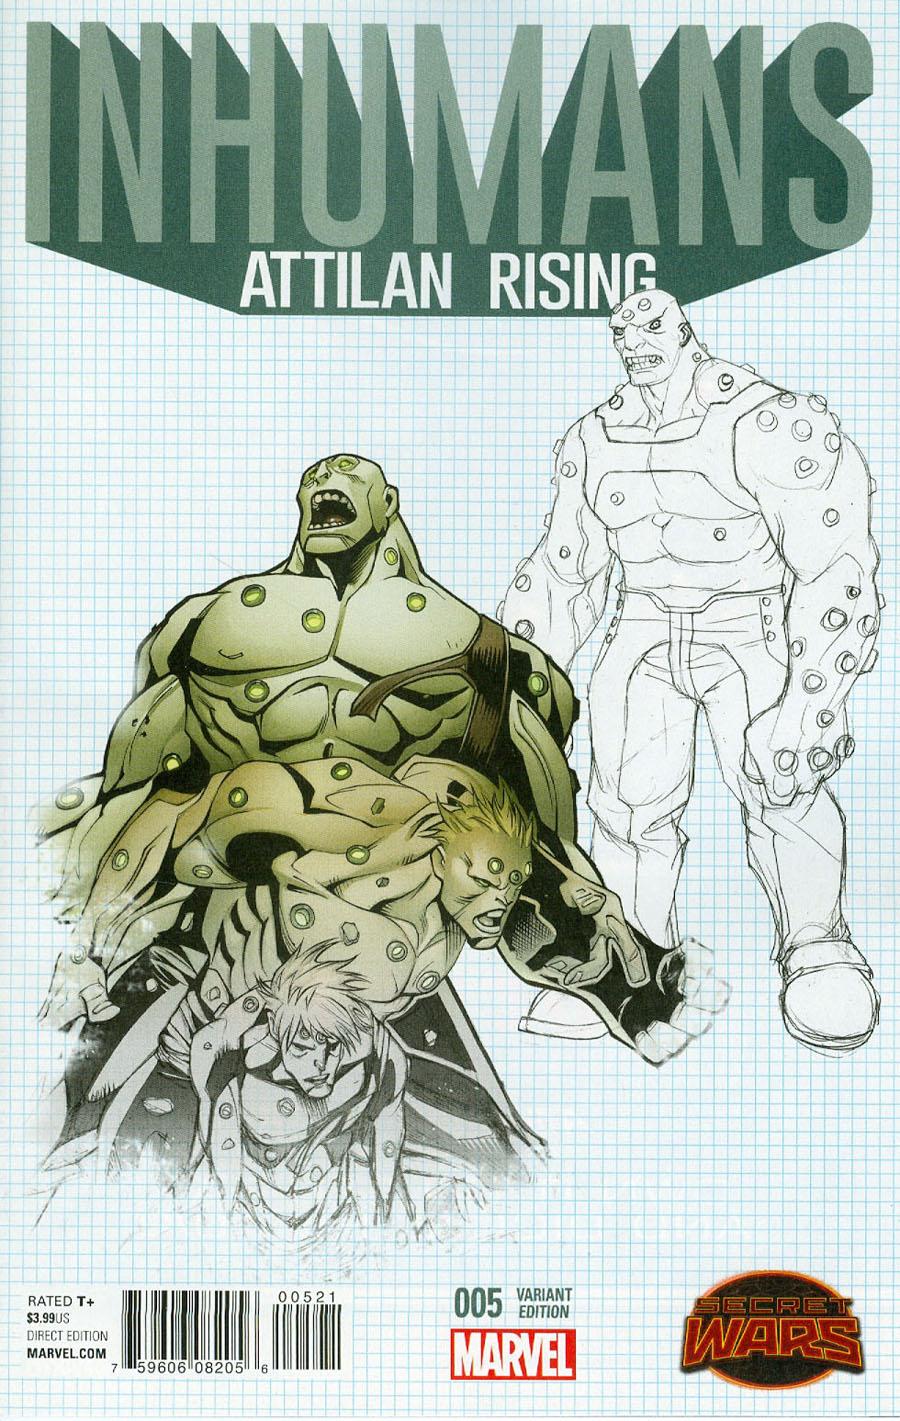 Inhumans Attilan Rising #5 Cover B Incentive Dave Johnson Design Variant Cover (Secret Wars Battleworld Tie-In)